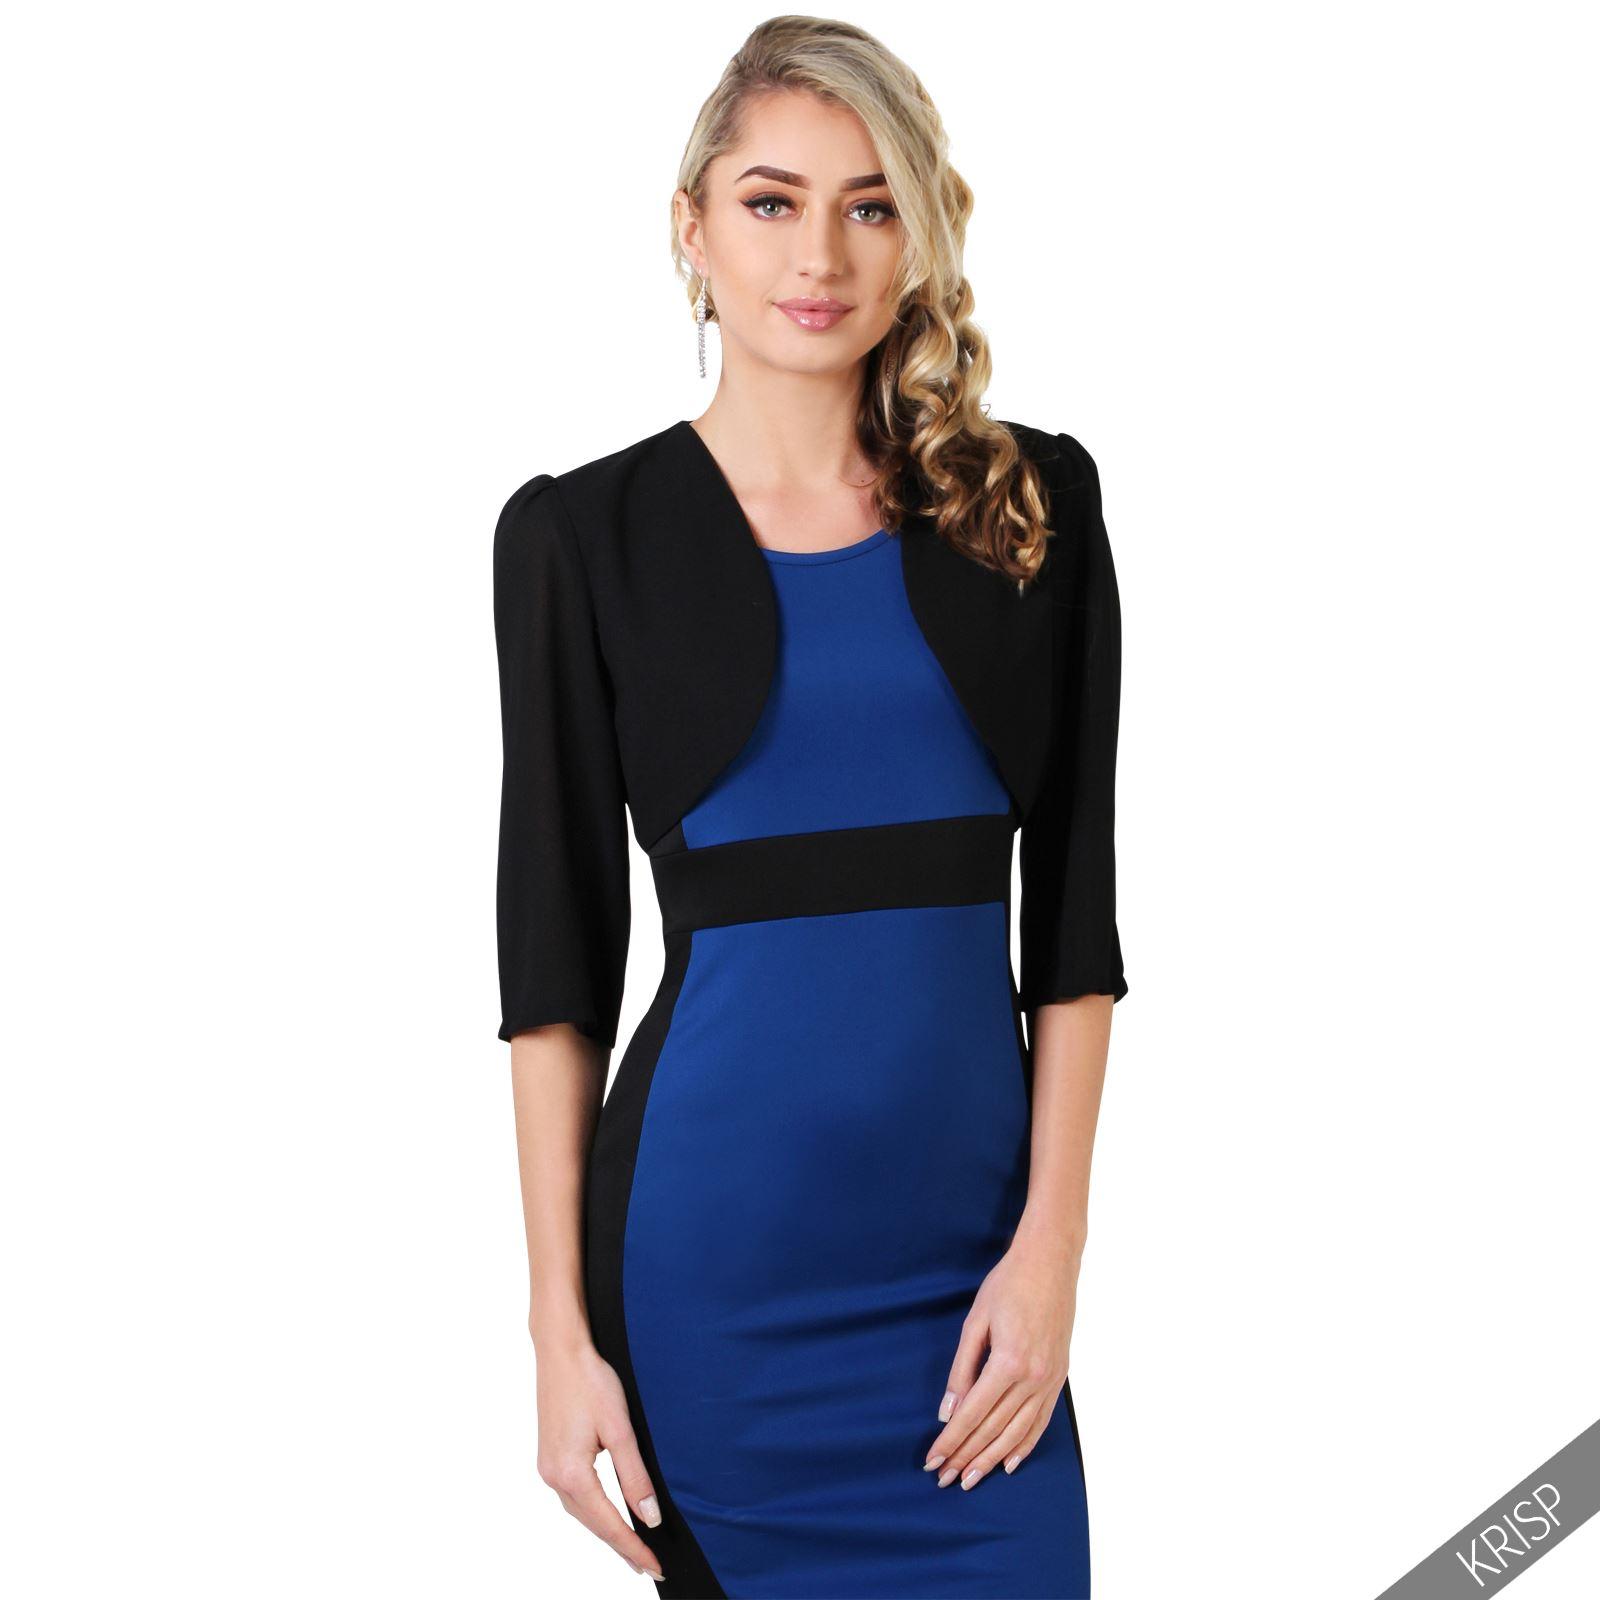 femmes veste courte bol ro blazer jacket manche 3 4 gilet cardigan cache epaule ebay. Black Bedroom Furniture Sets. Home Design Ideas